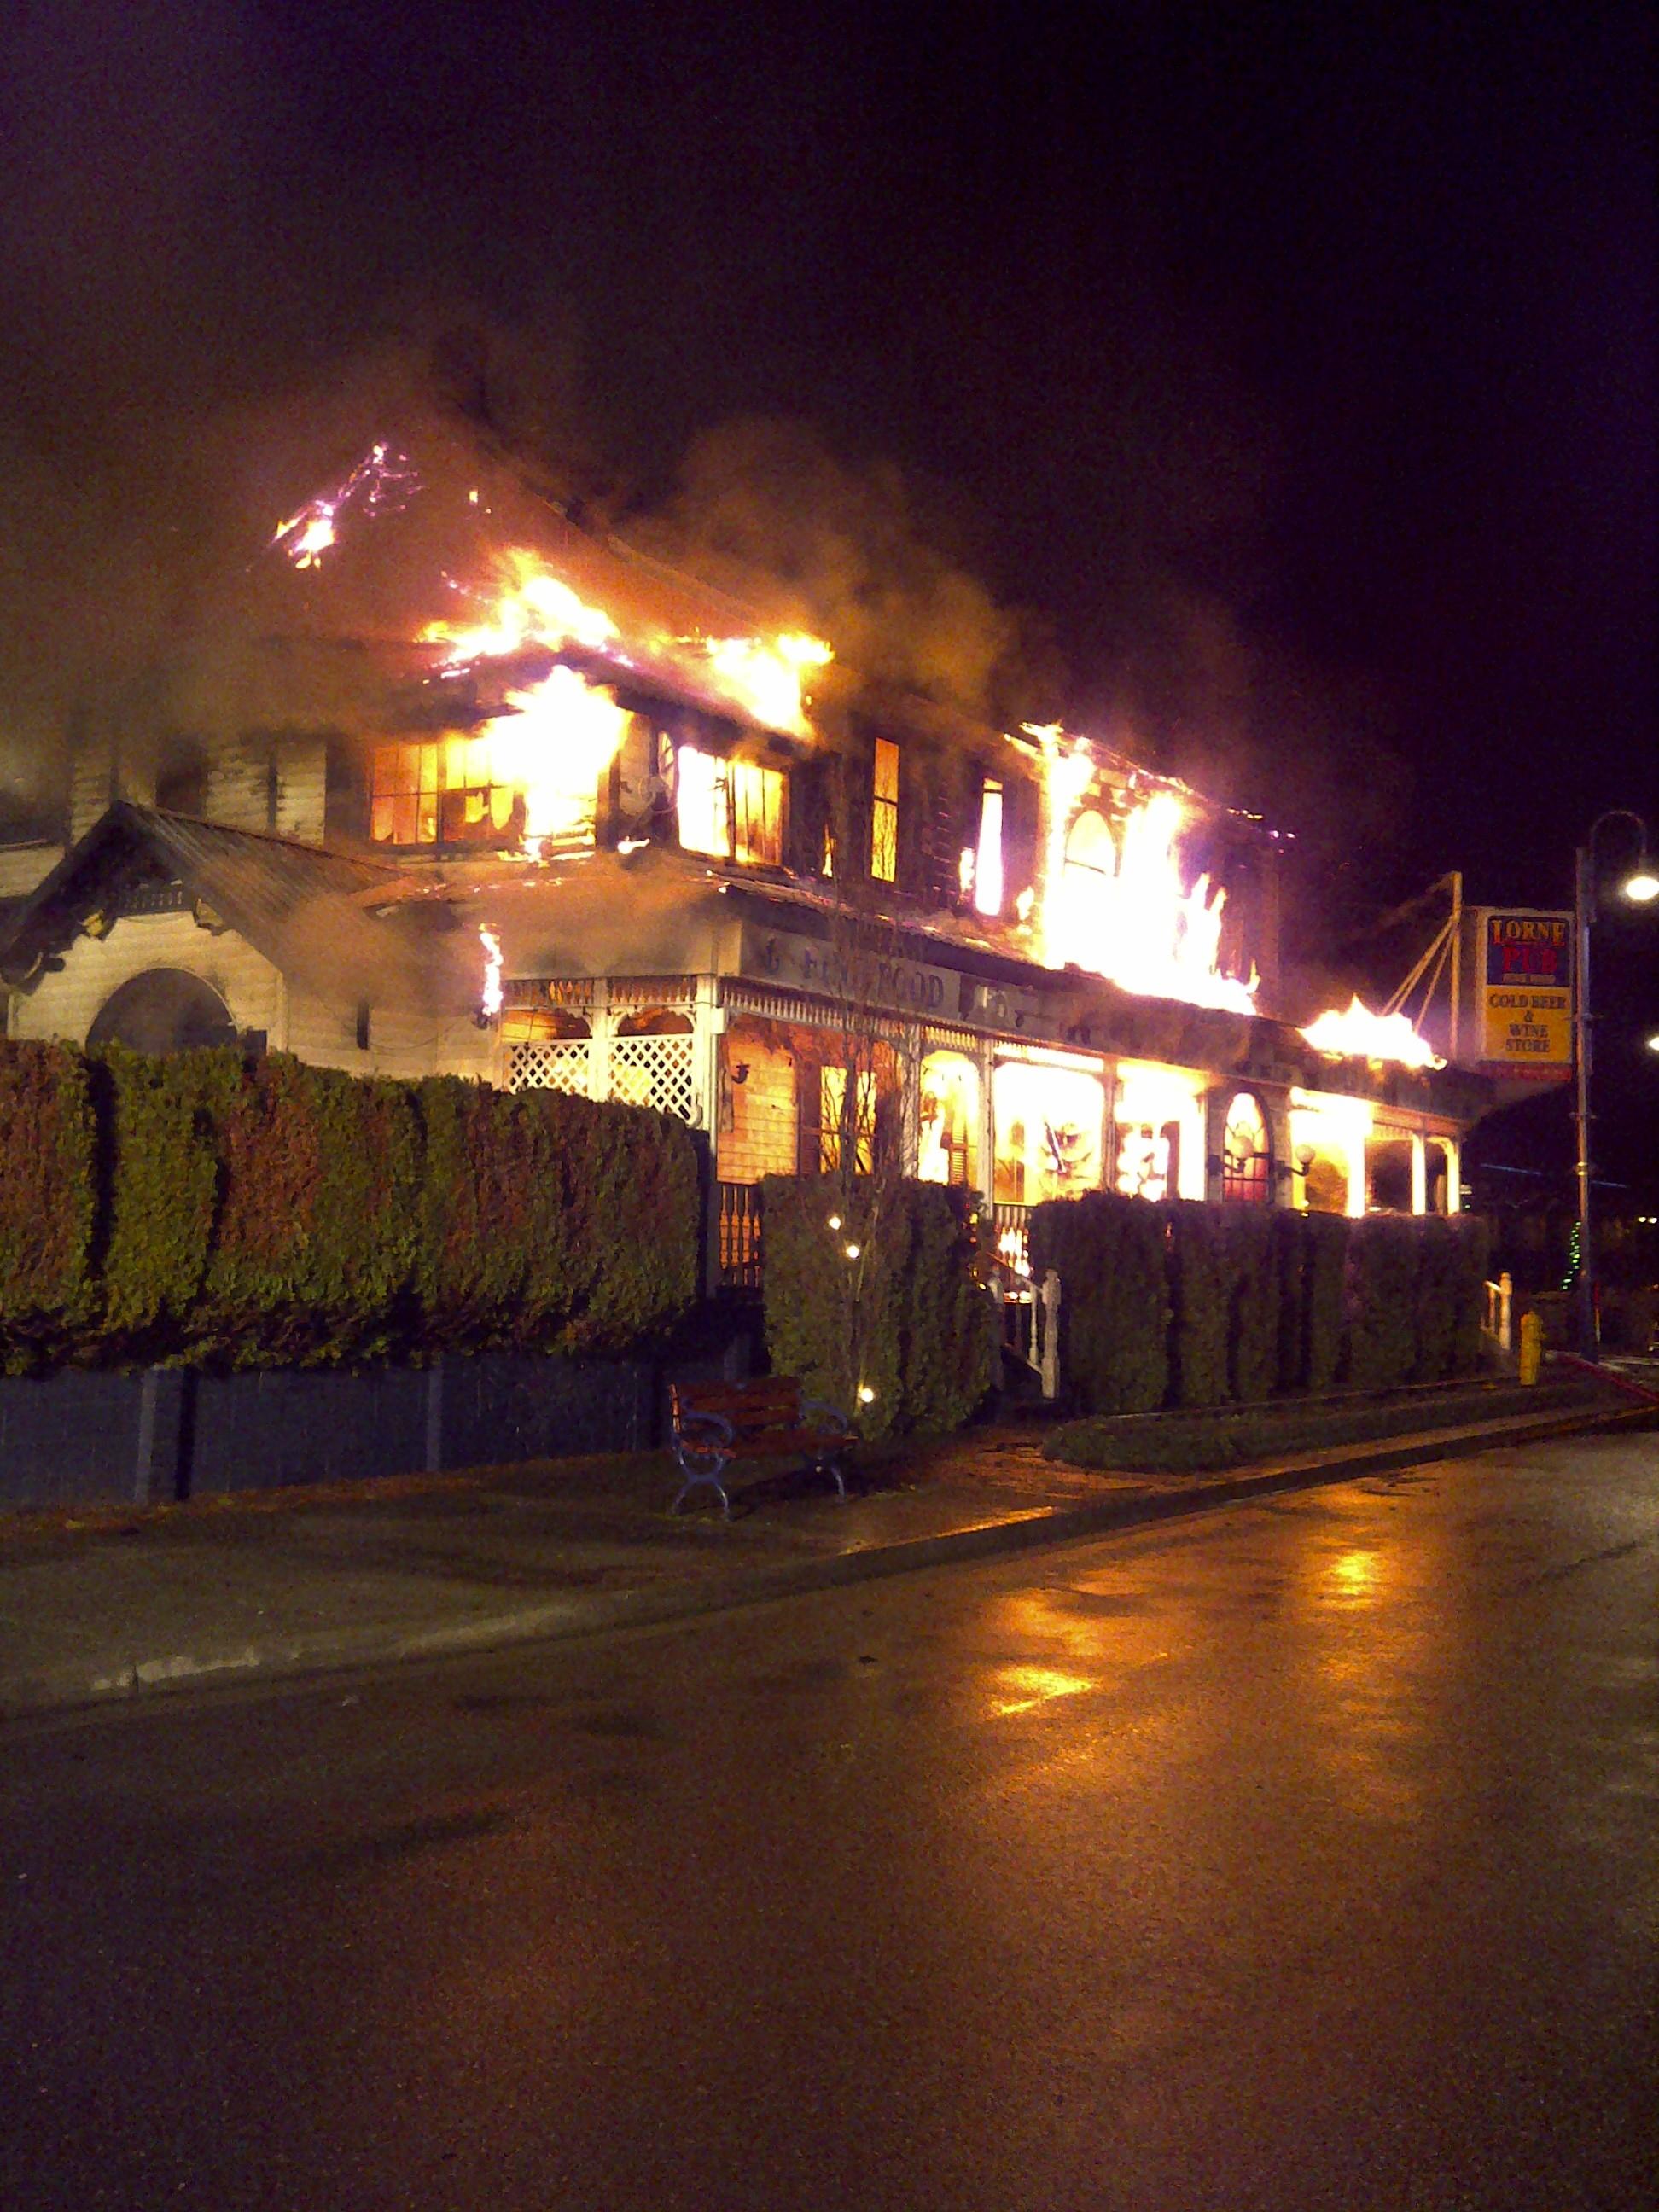 The Lorne Hotel Fire